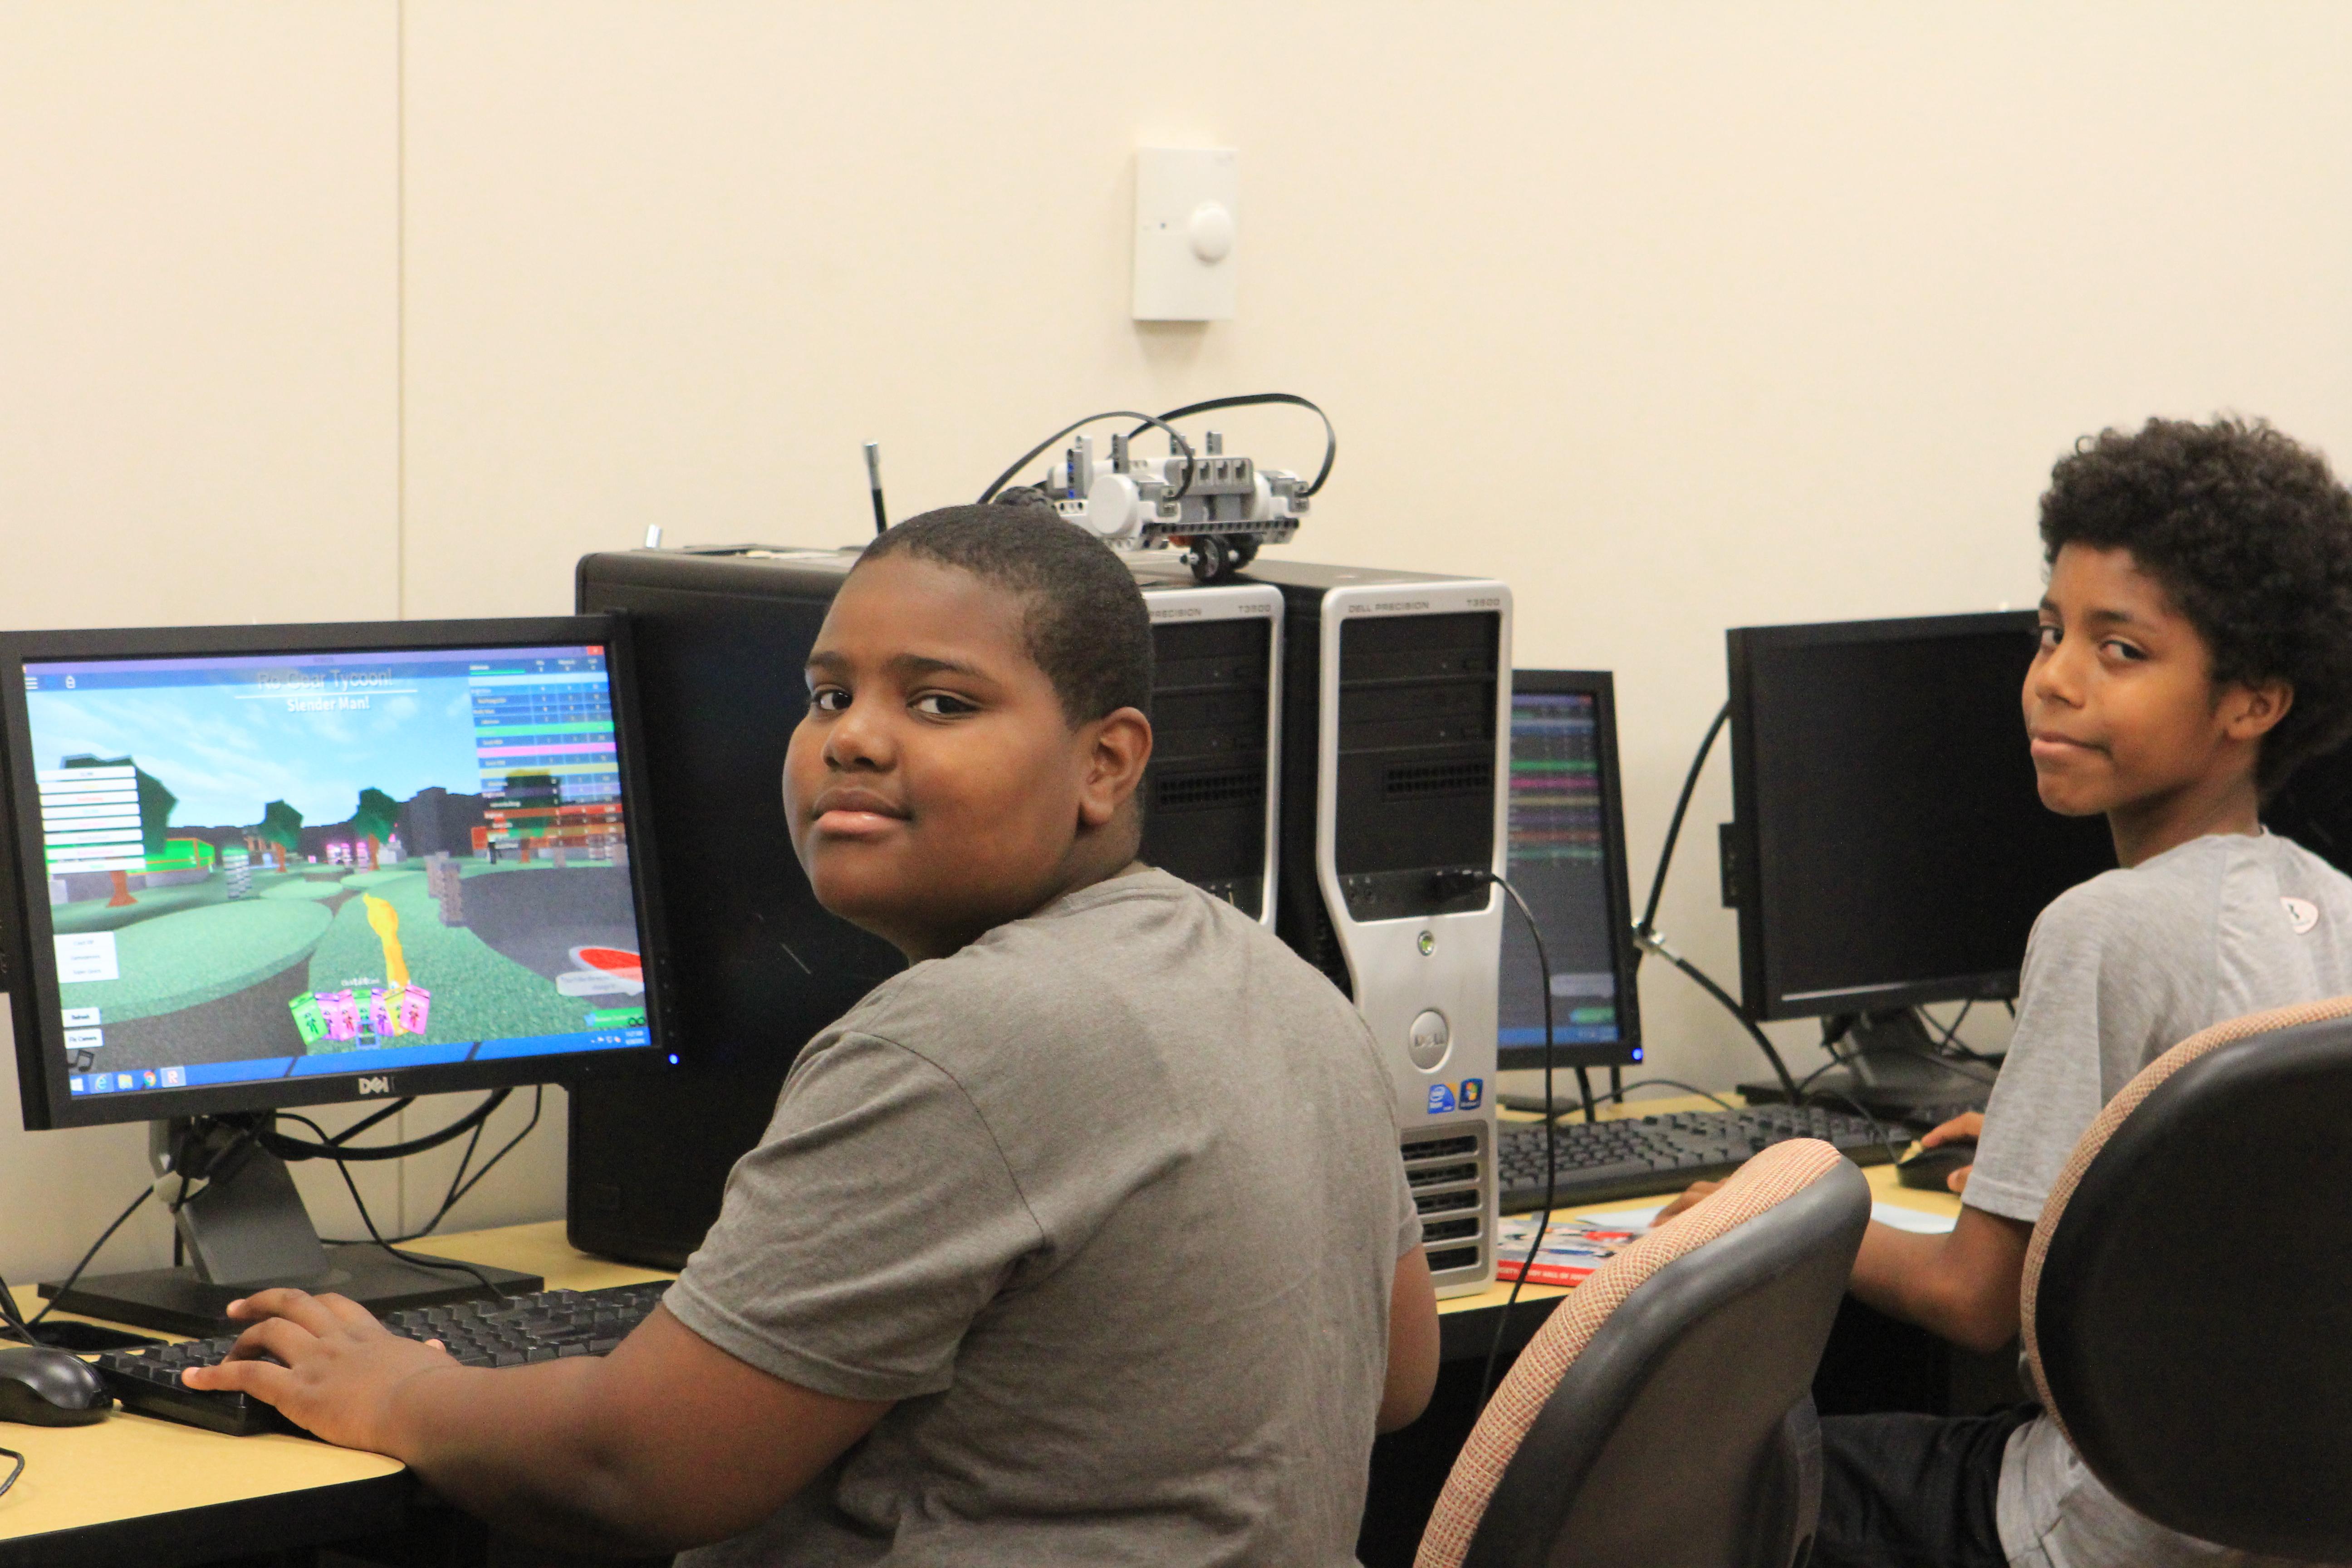 Teen black males working on computers